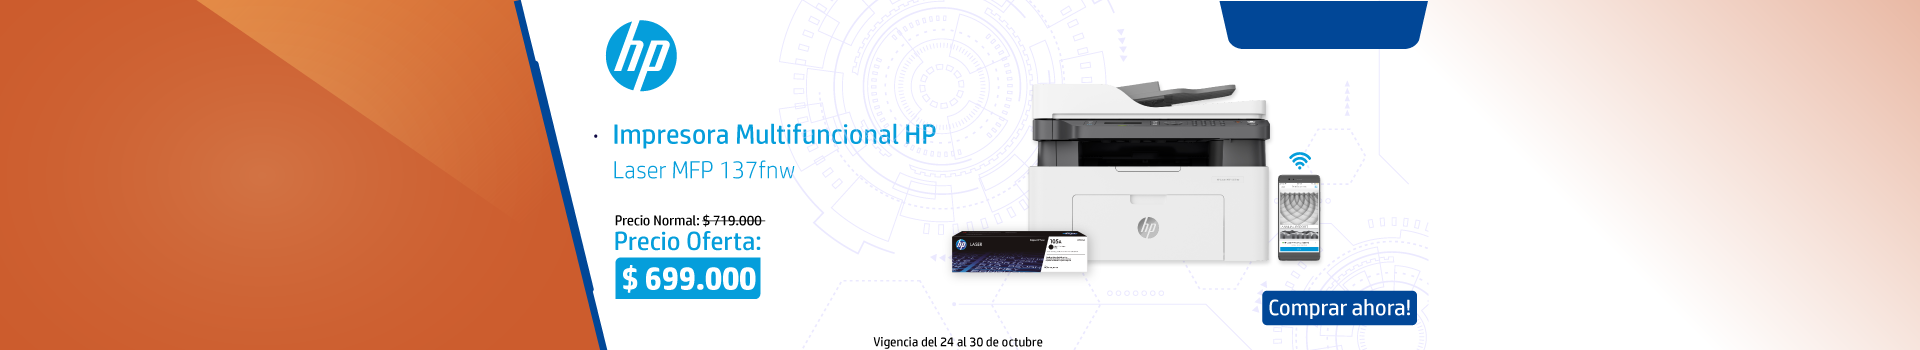 banner-de-categoria-Impresora-Multifuncional-HP-Laser-MFP-137fnw---1920-x-350-px